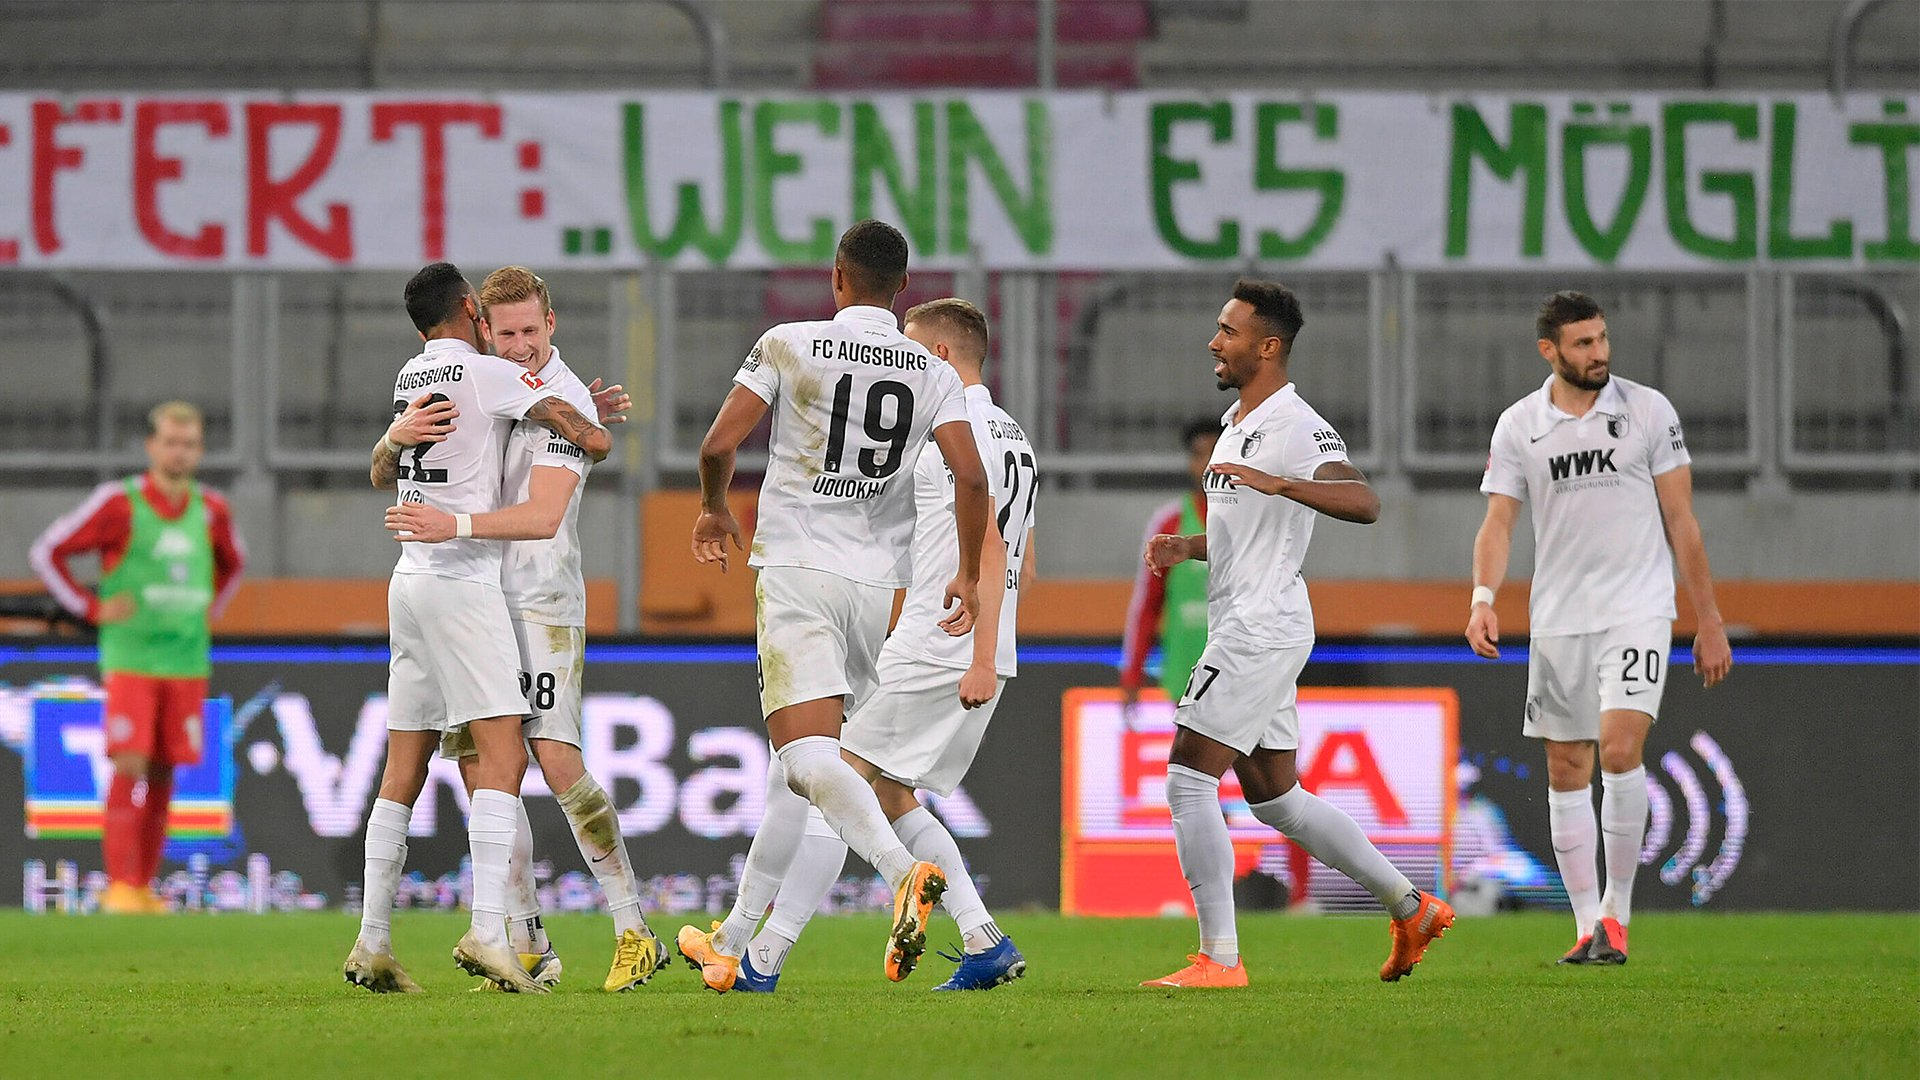 Fca Gegen Mainz